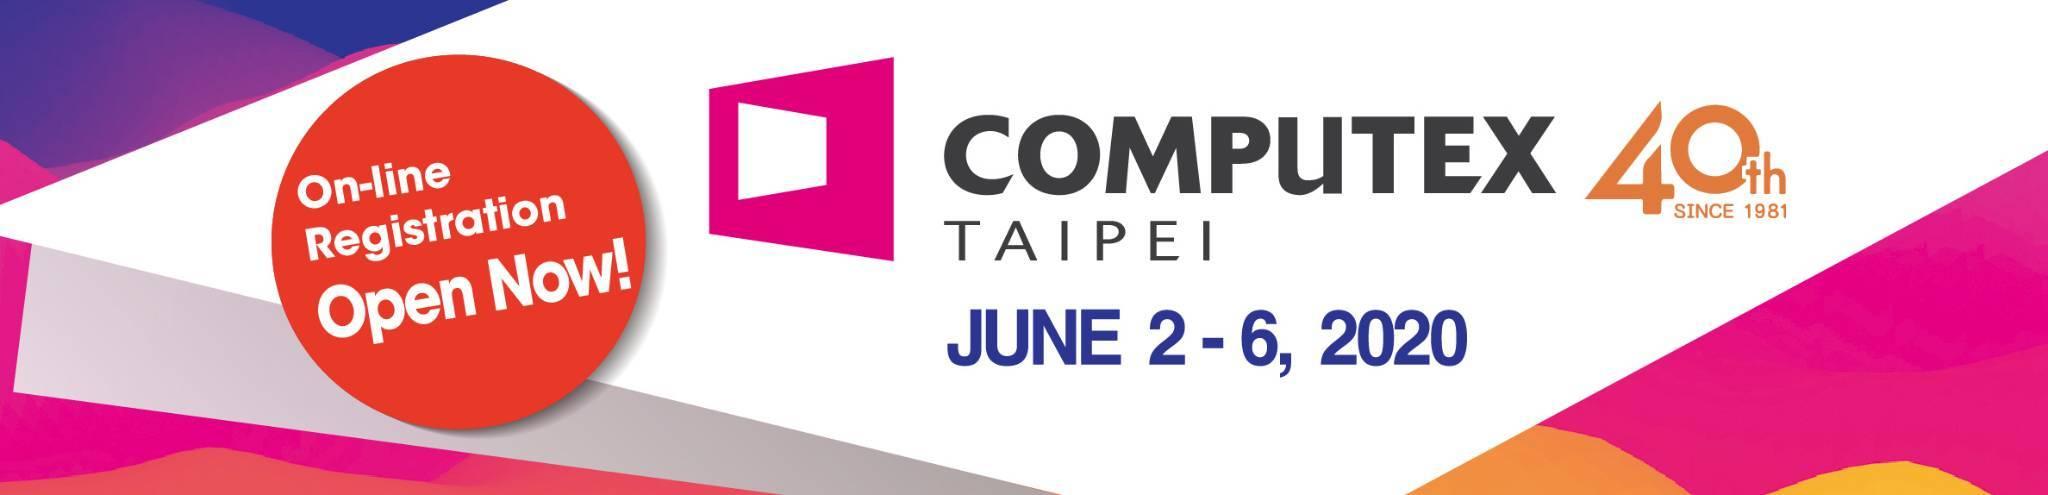 Computex 2020 banner